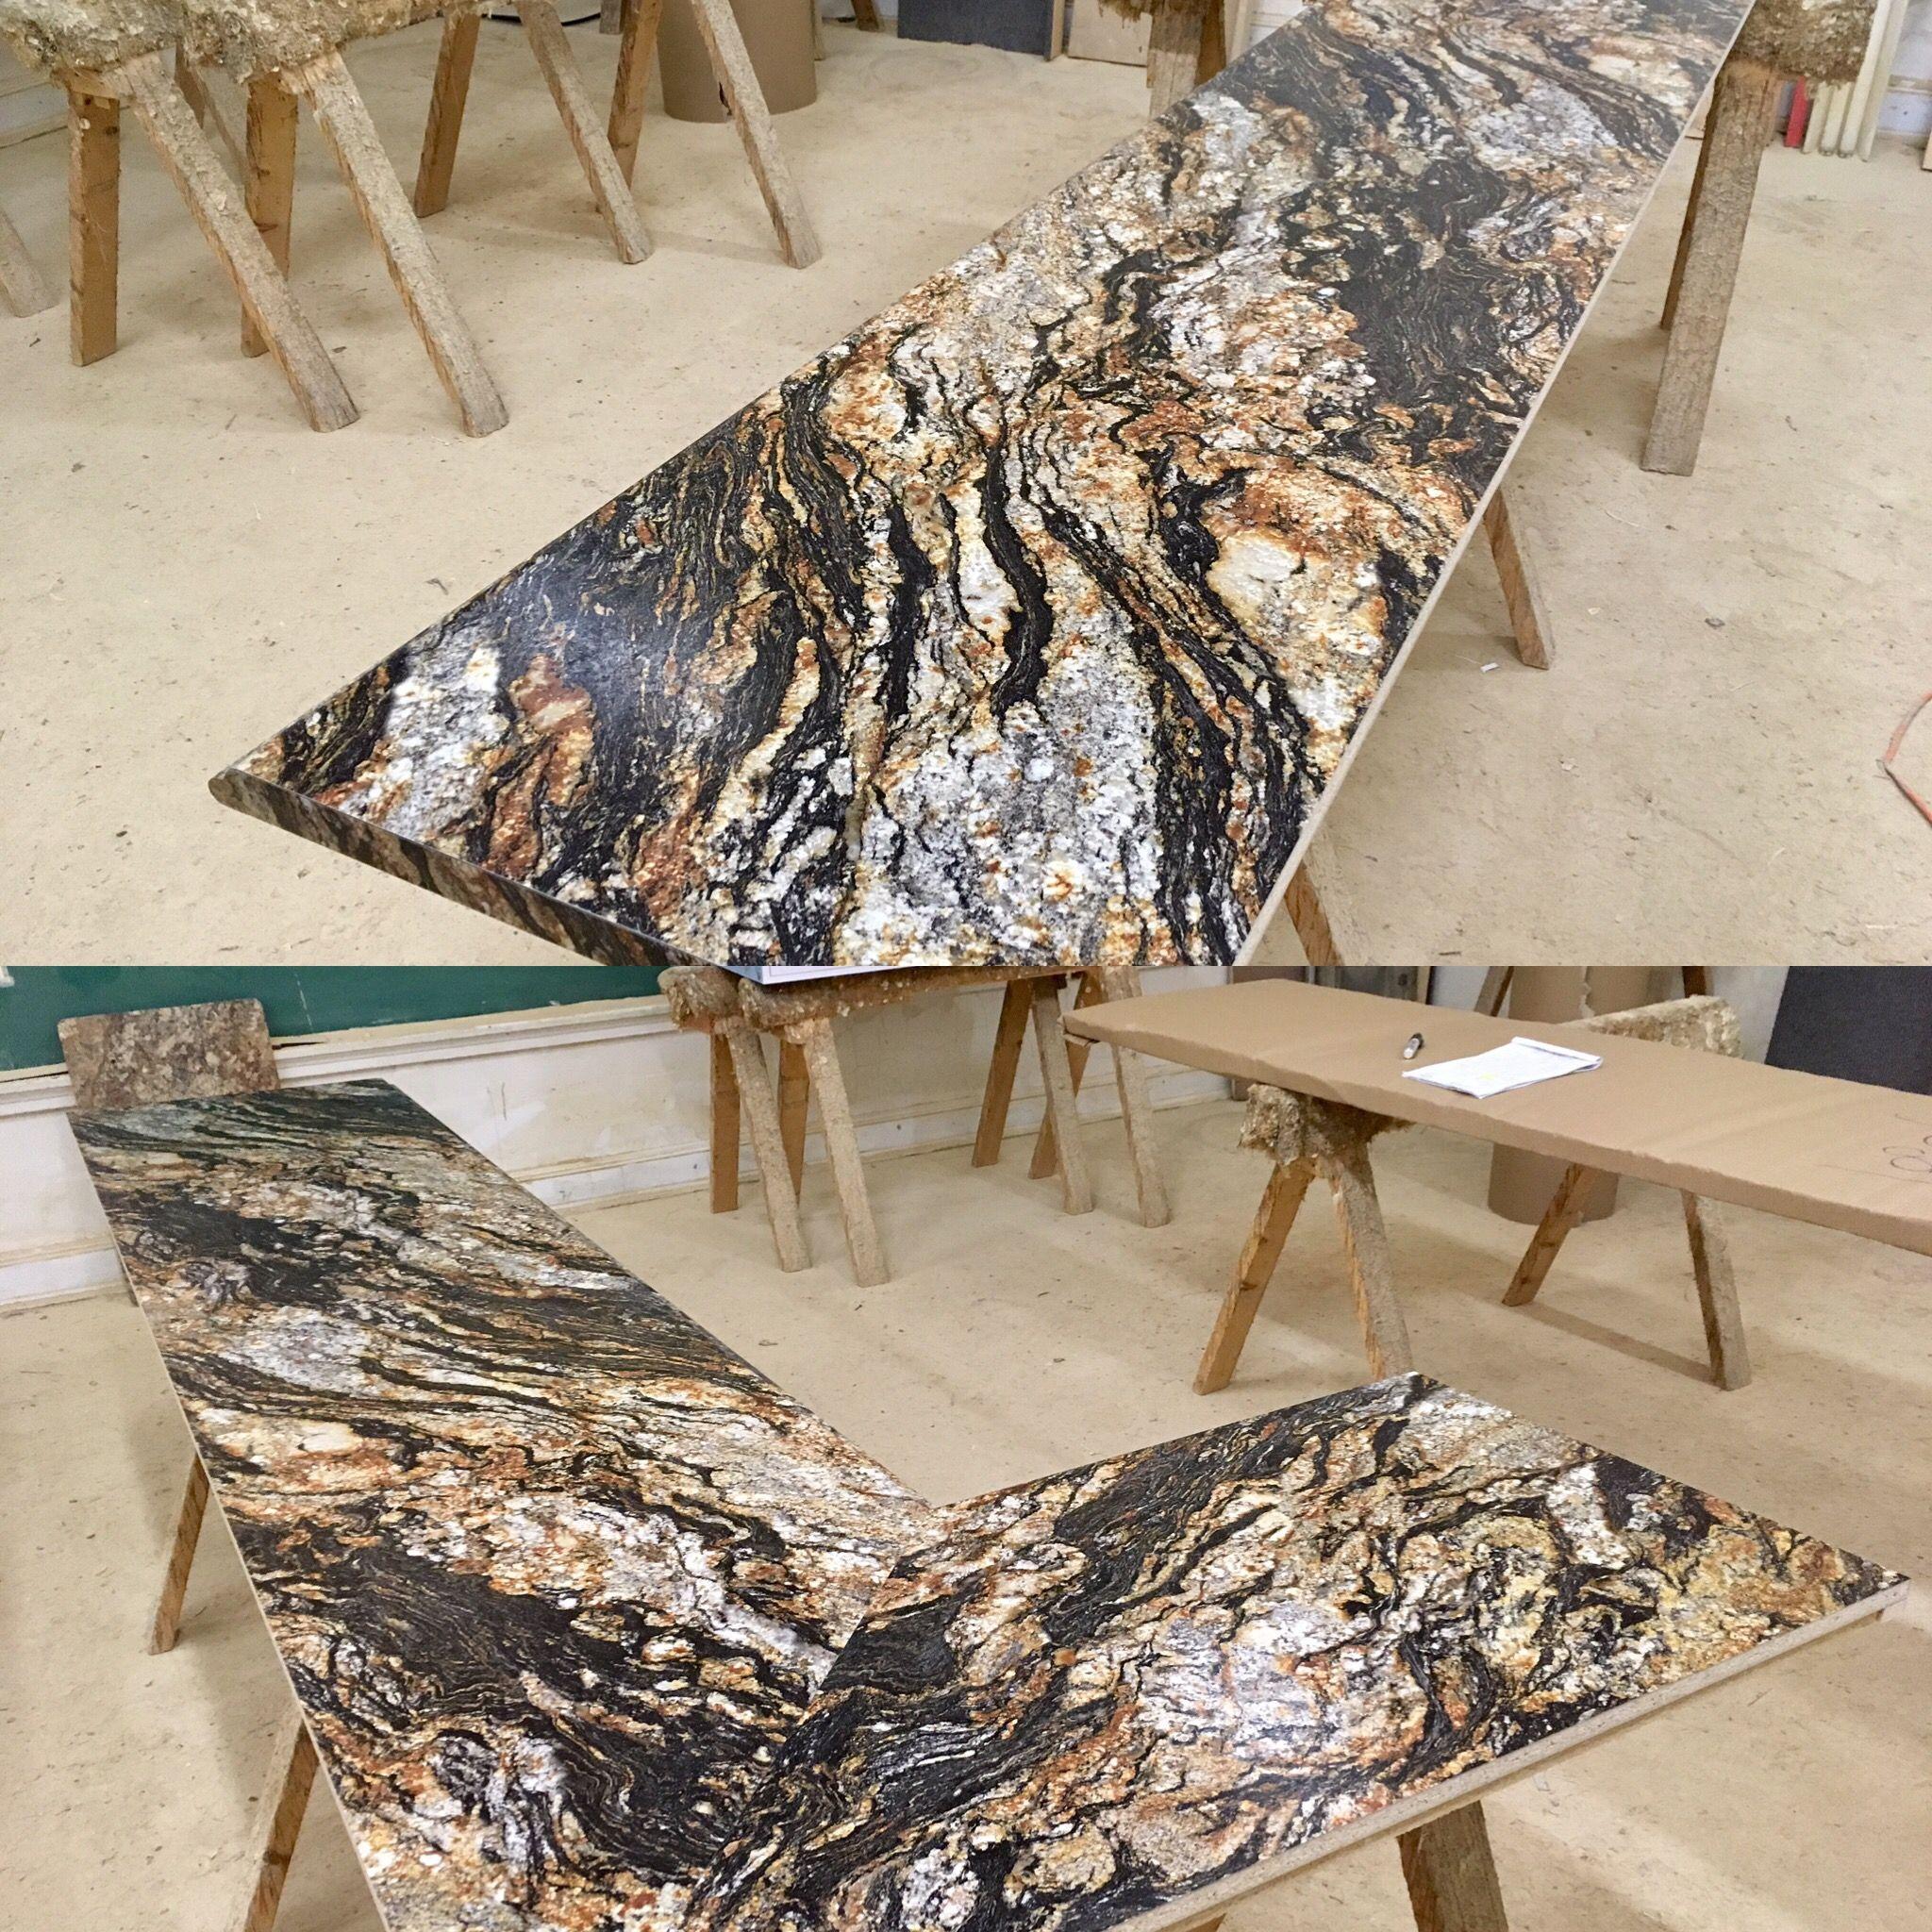 Kitchen Countertops Upgrade: Formica's Magma Black, Radiance Finish, Valencia Profile